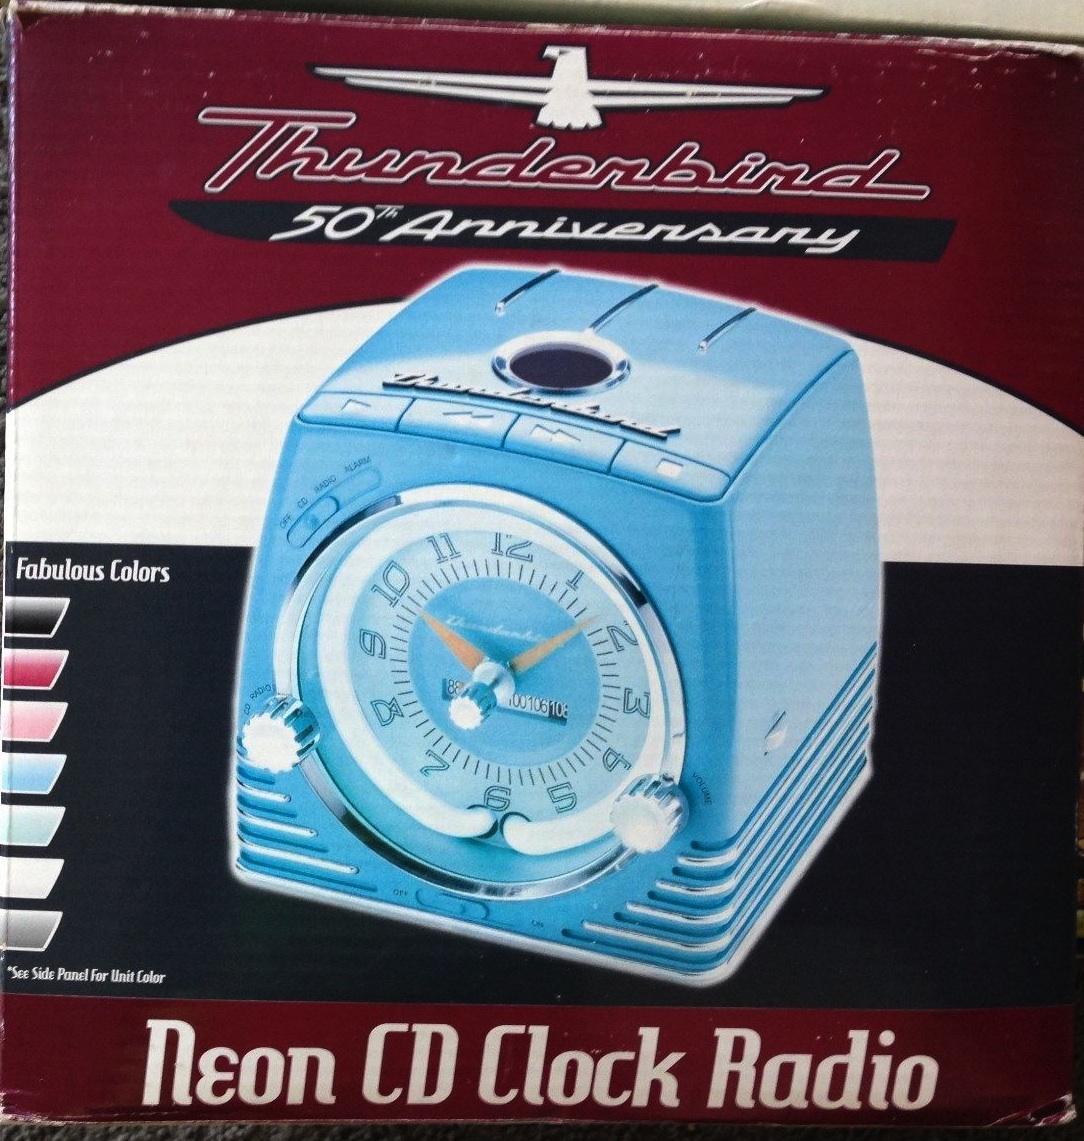 And clothing thunderbird neon clock radio cd player combo